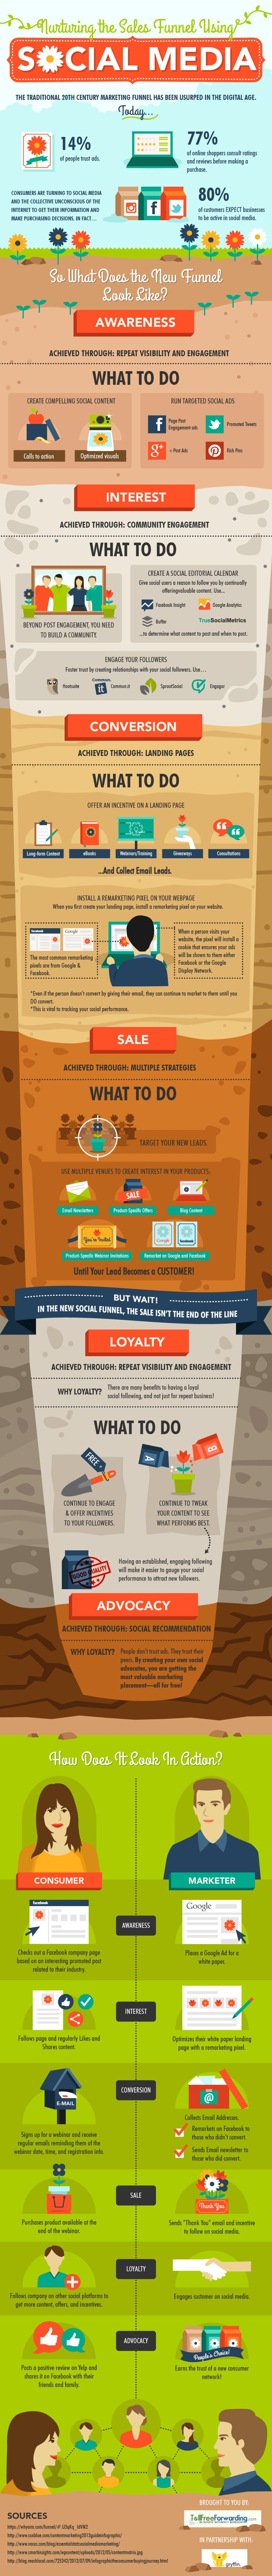 Nurturing the Sales Funnel Using #SocialMedia - #infographic #marketing #SMM